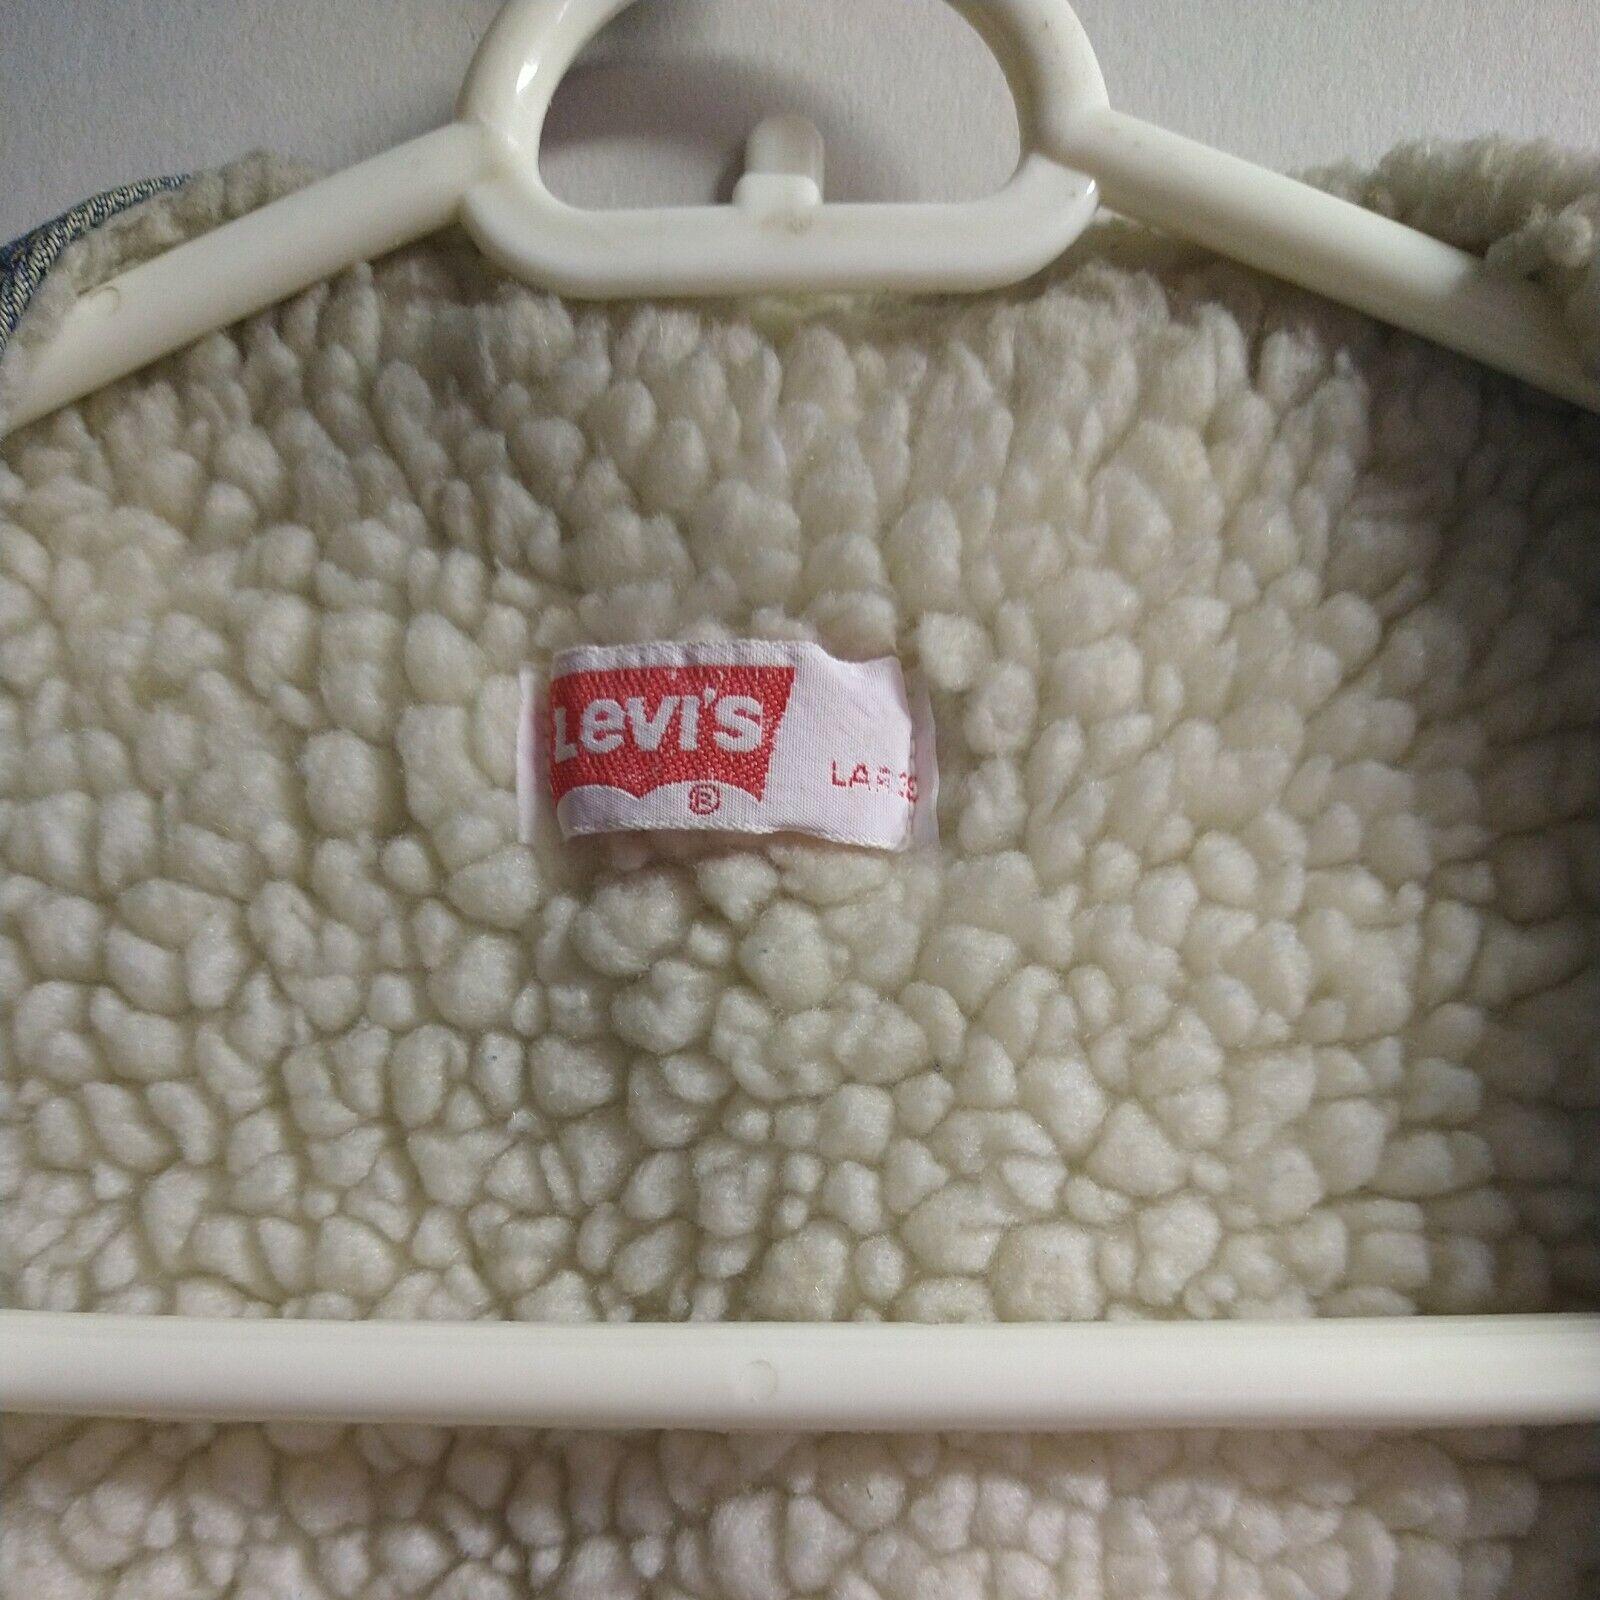 Levis vintage clothing Vest made in USA - image 4